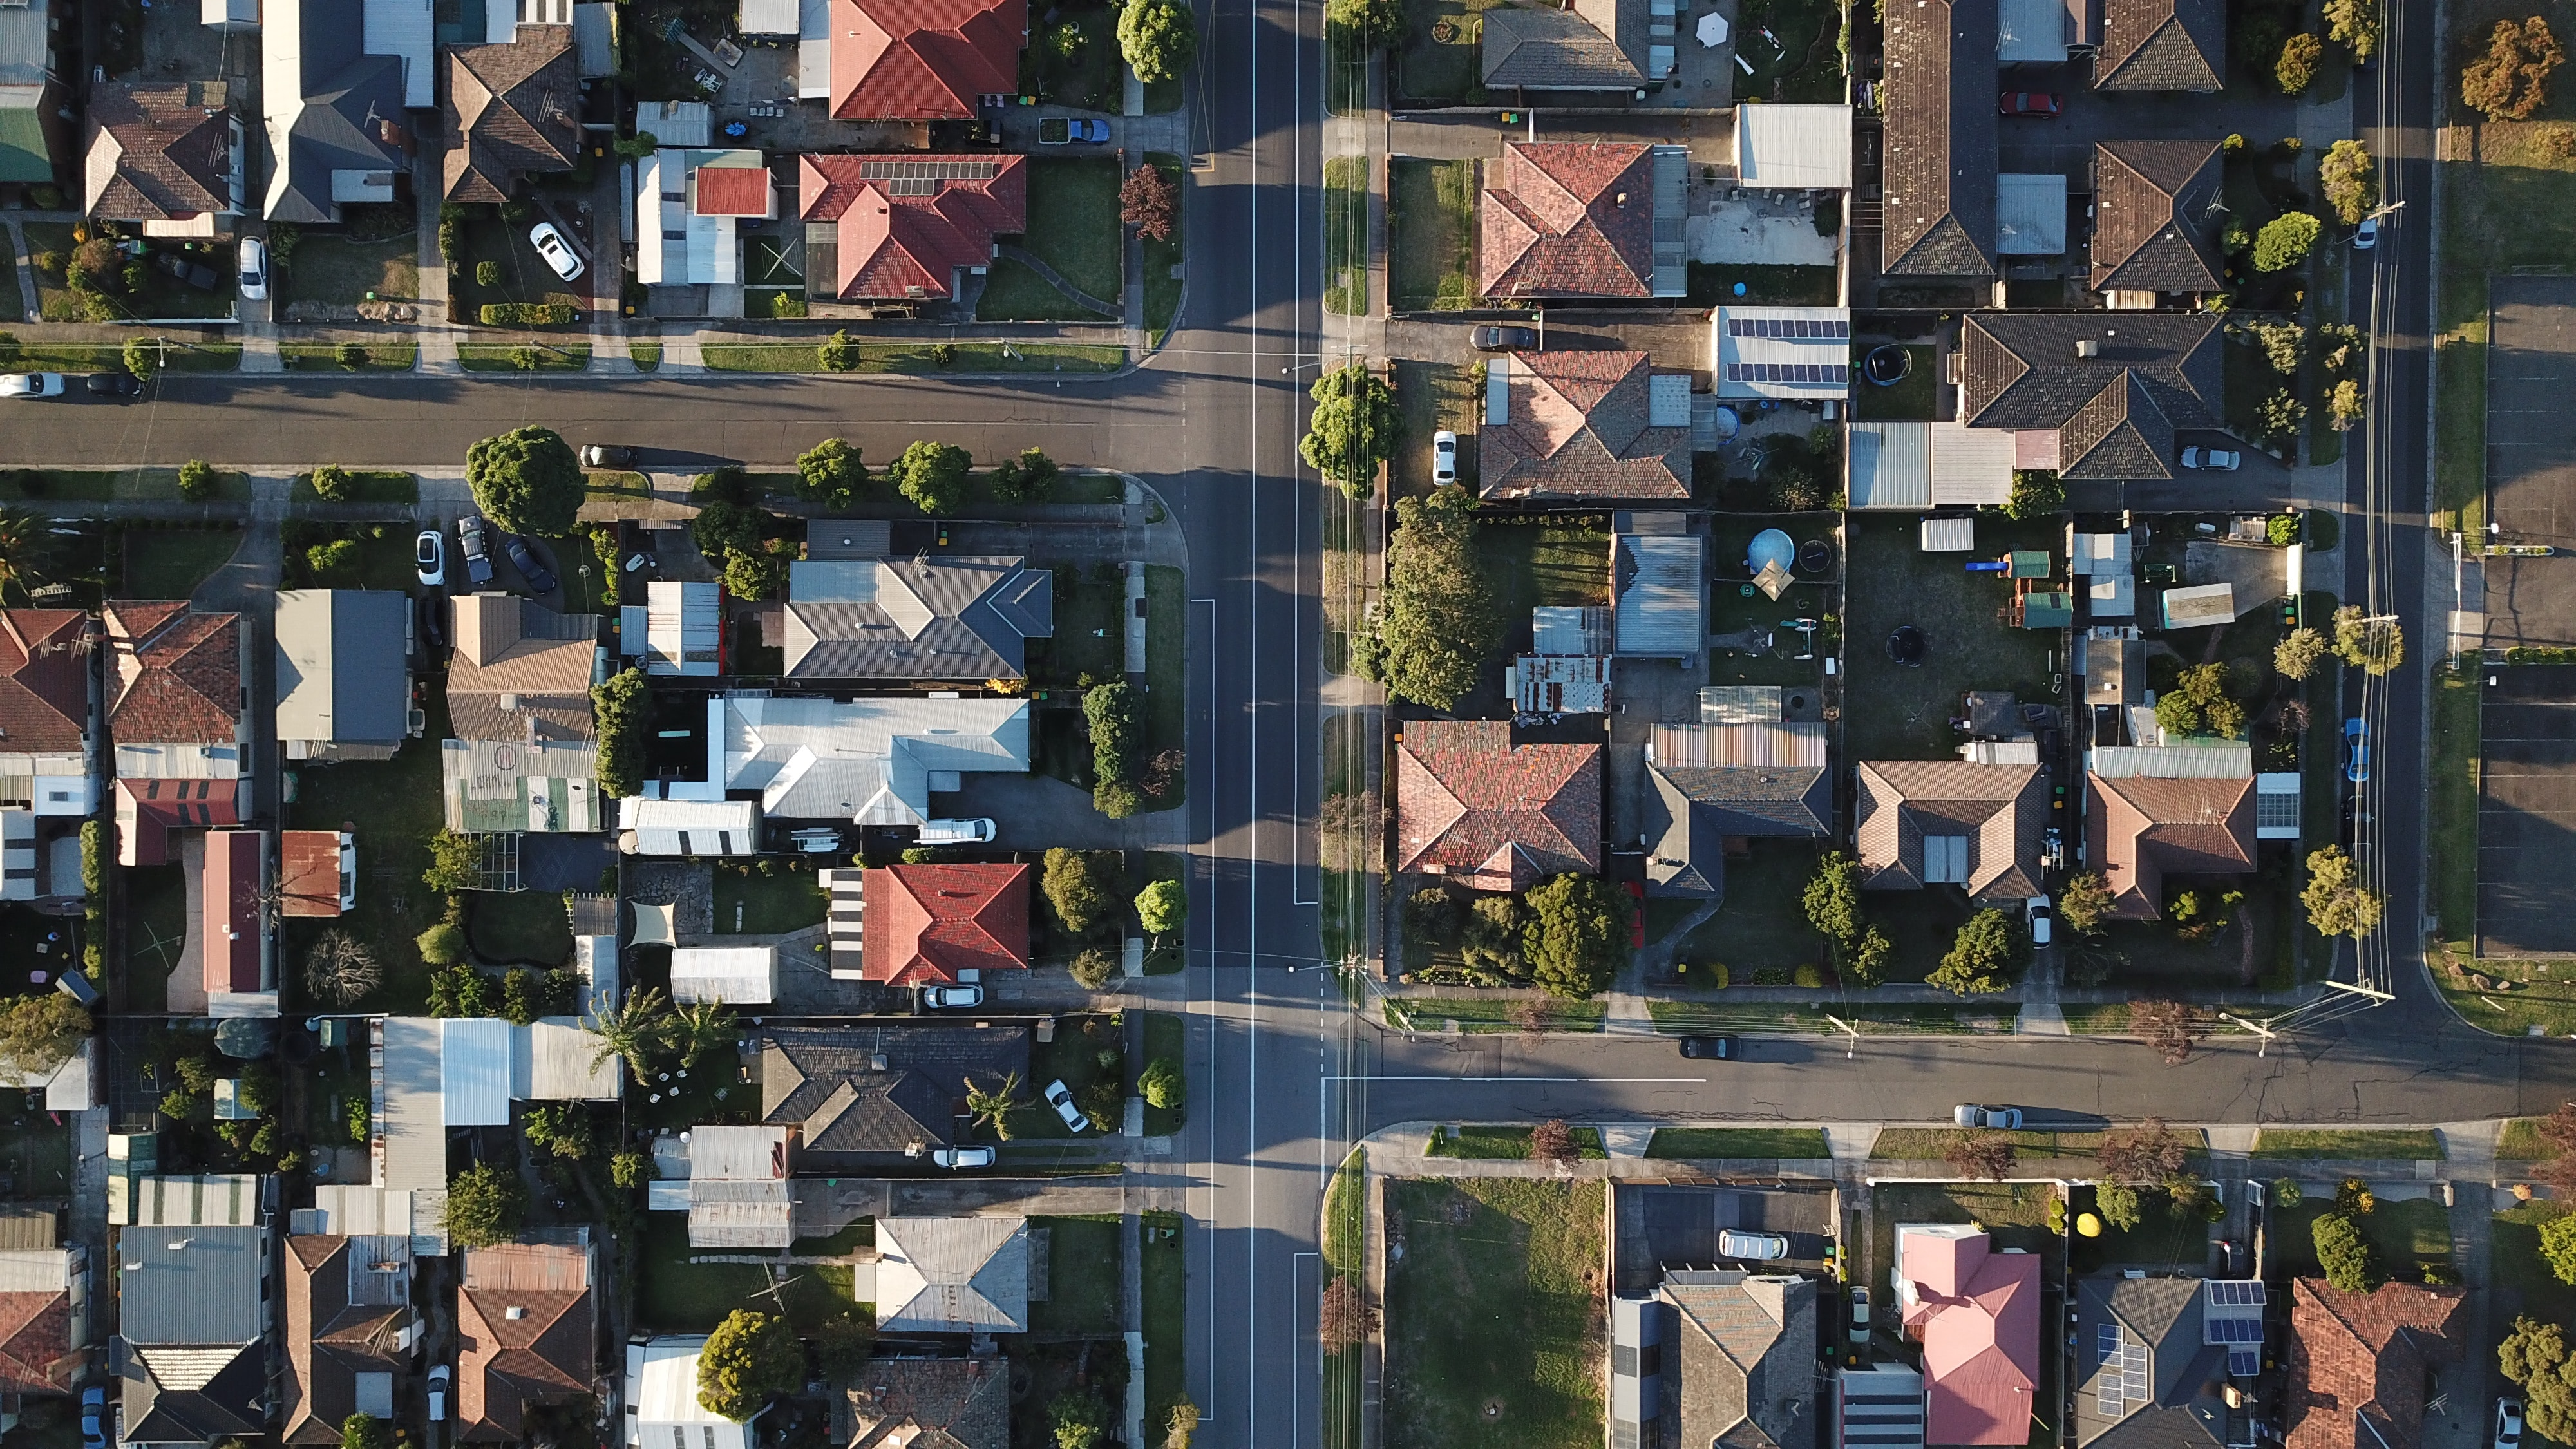 Top down suburbs